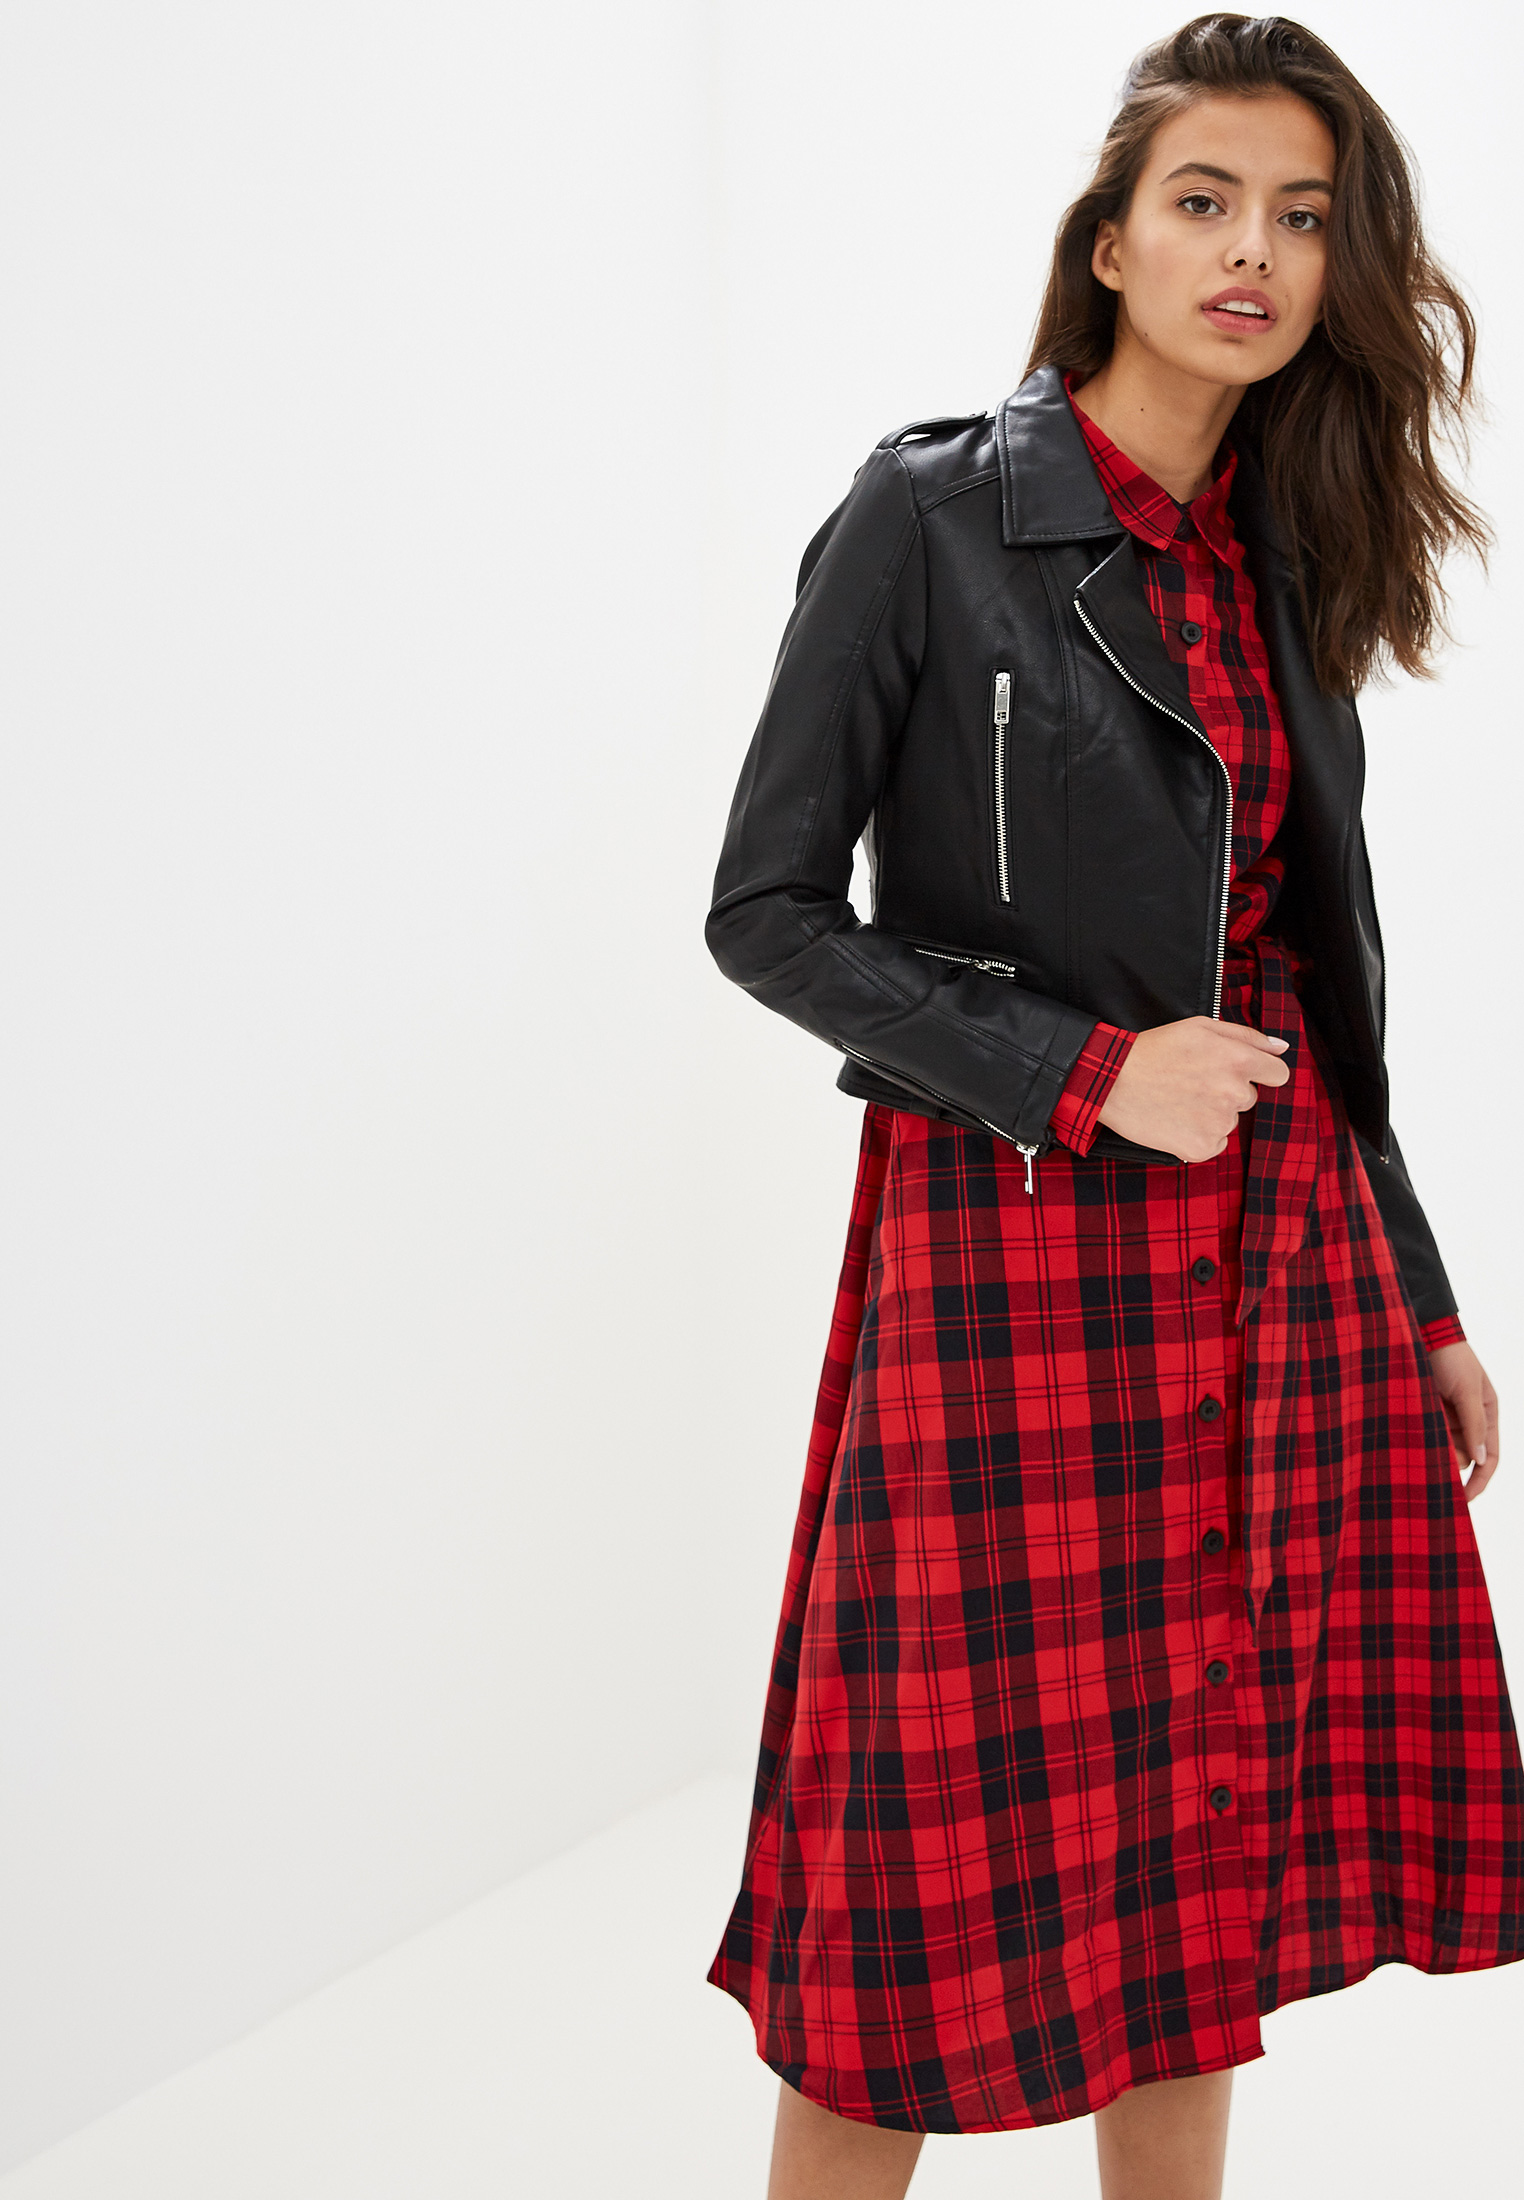 Куртка кожаная, Befree, цвет: черный. Артикул: MP002XW0RE0N. Одежда / Верхняя одежда / Косухи